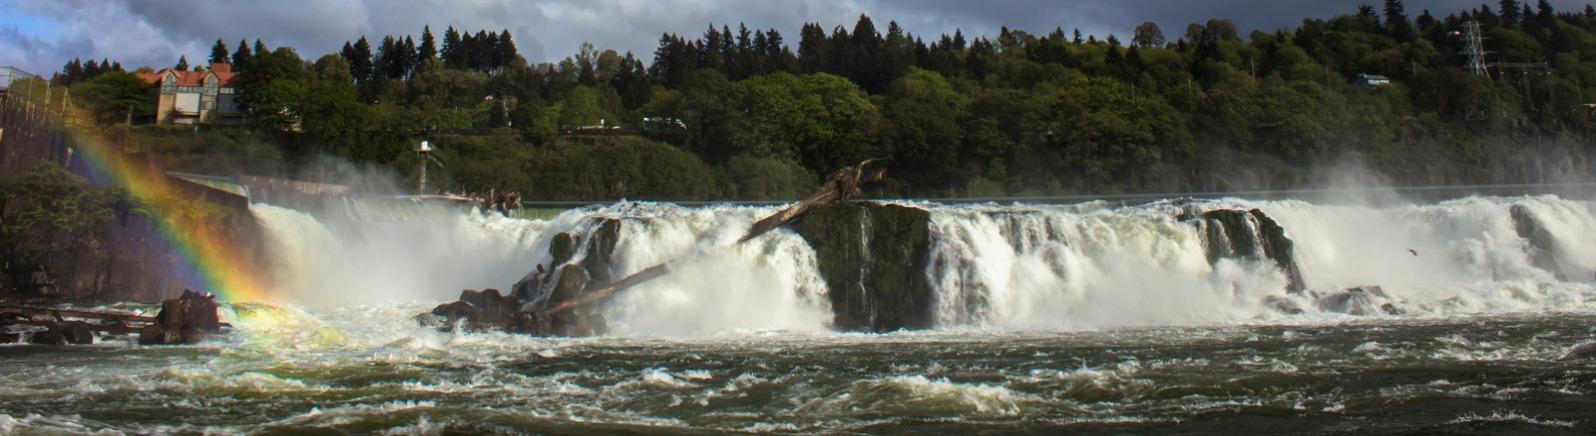 Willamette Falls, Rainbow